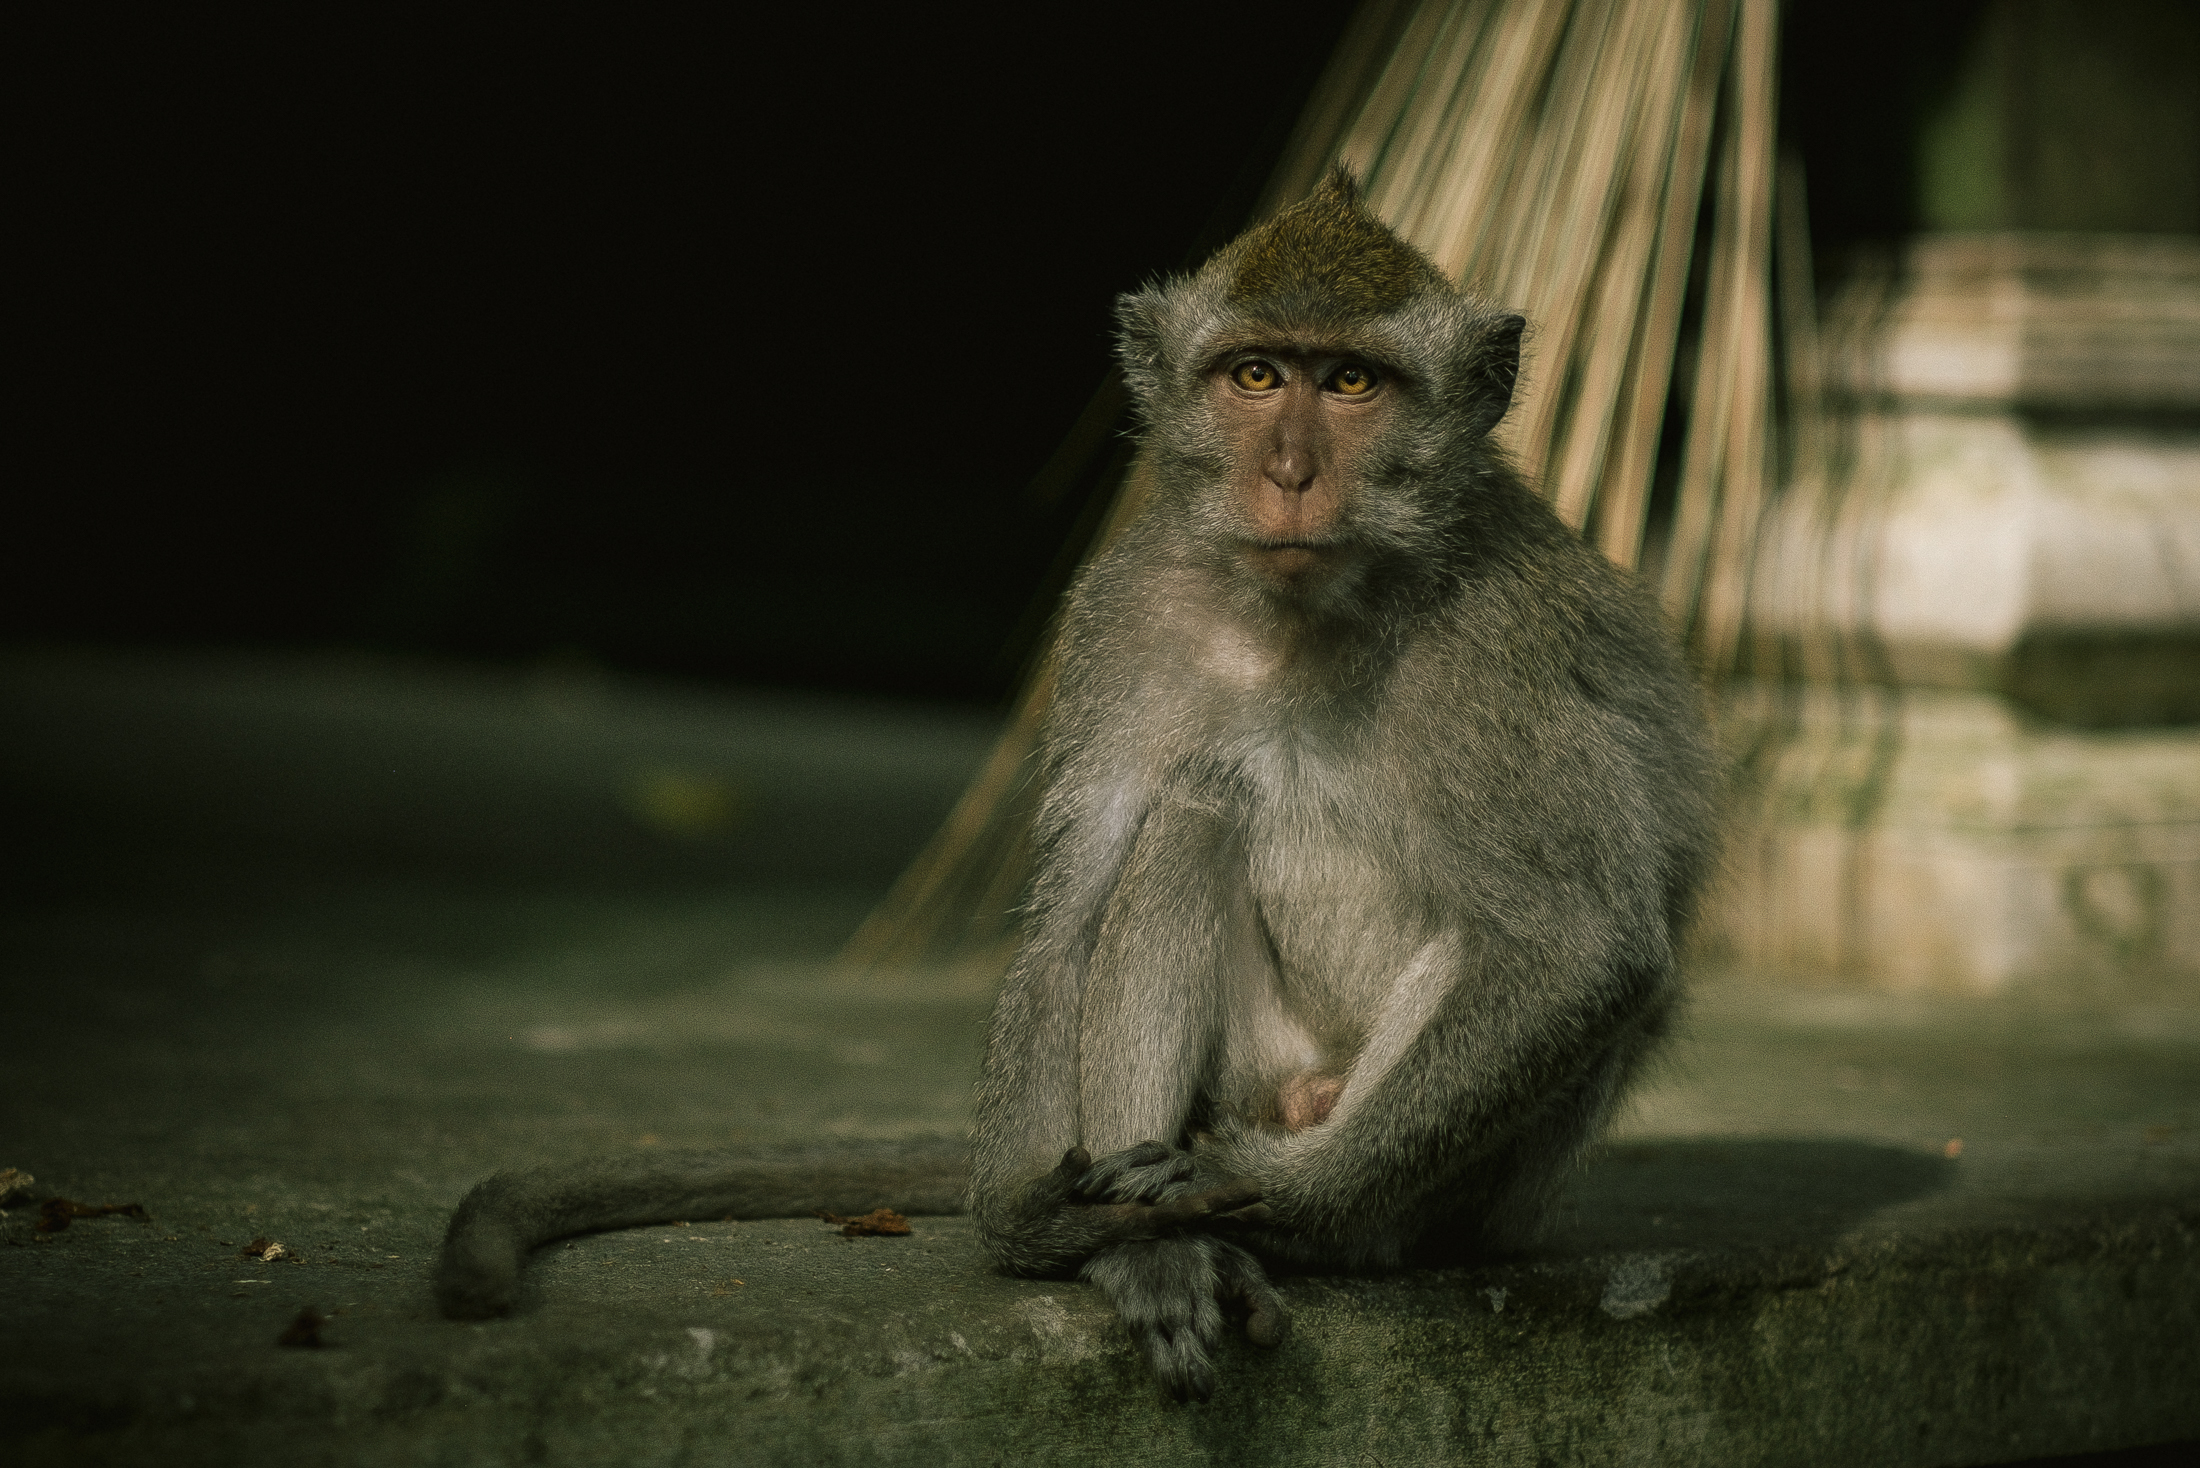 bali_day9_monkey-5.jpg